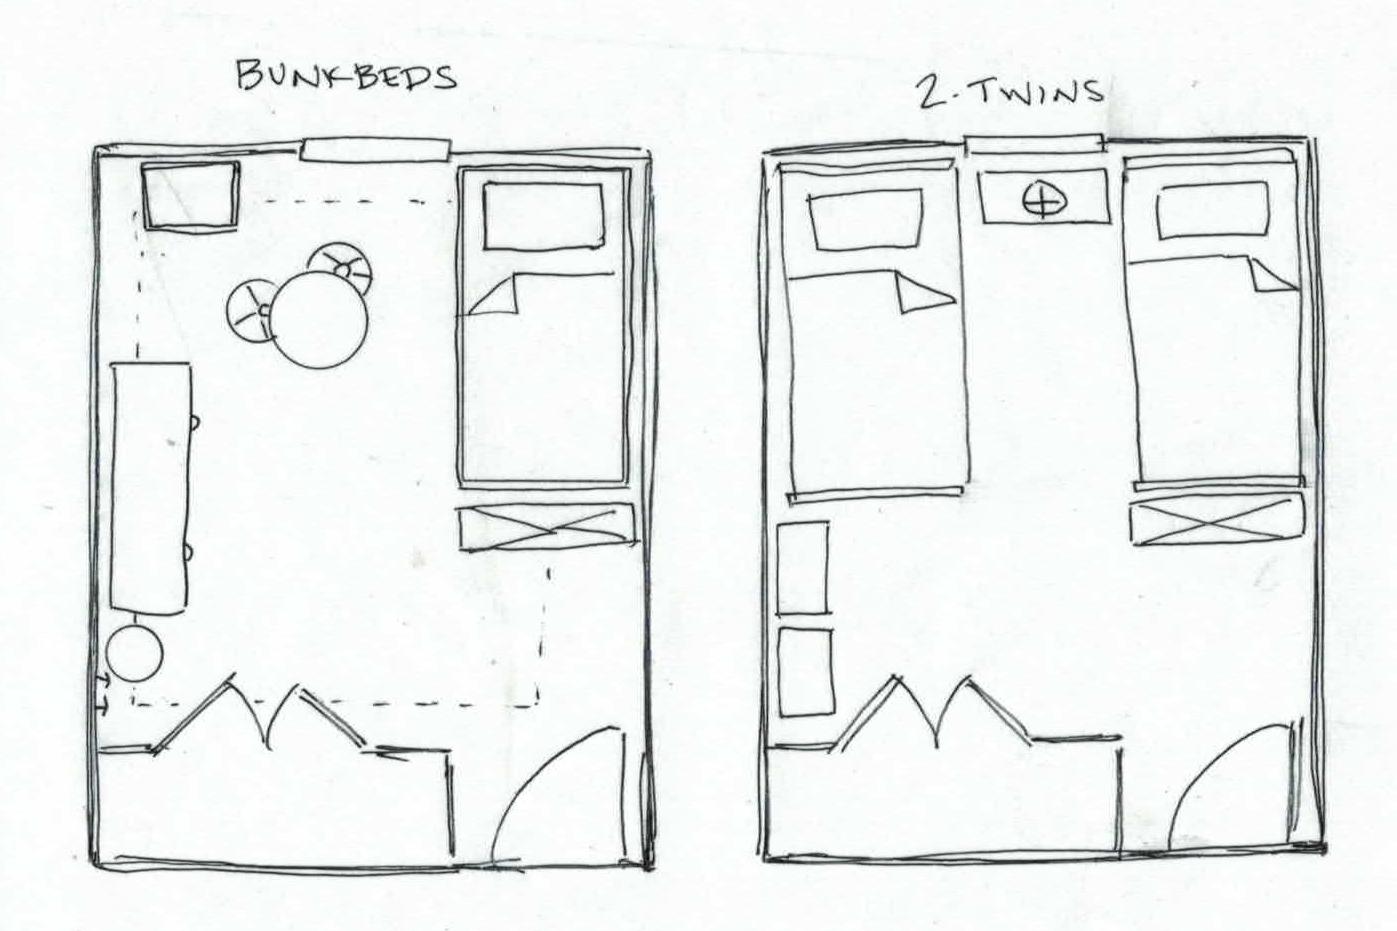 proposed plans c's room.jpg